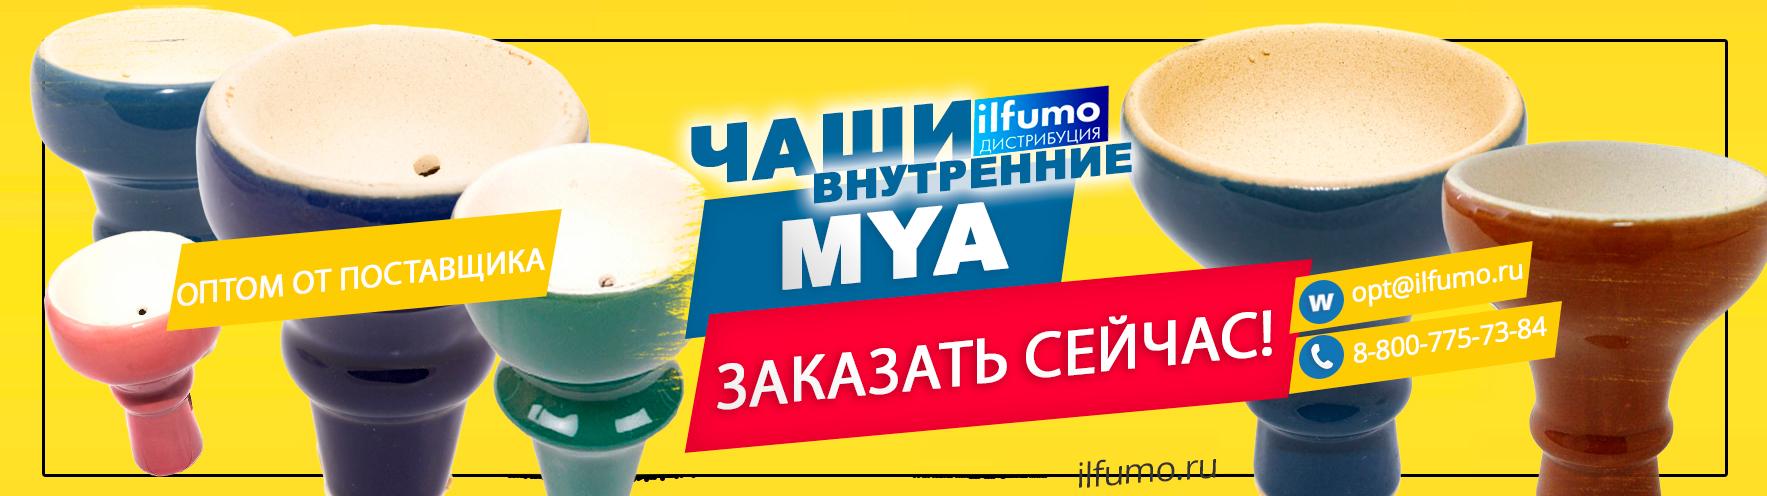 vnutrennie glubokie chashki dlja tabaka mya - Внутренние глубокие чаши MYA